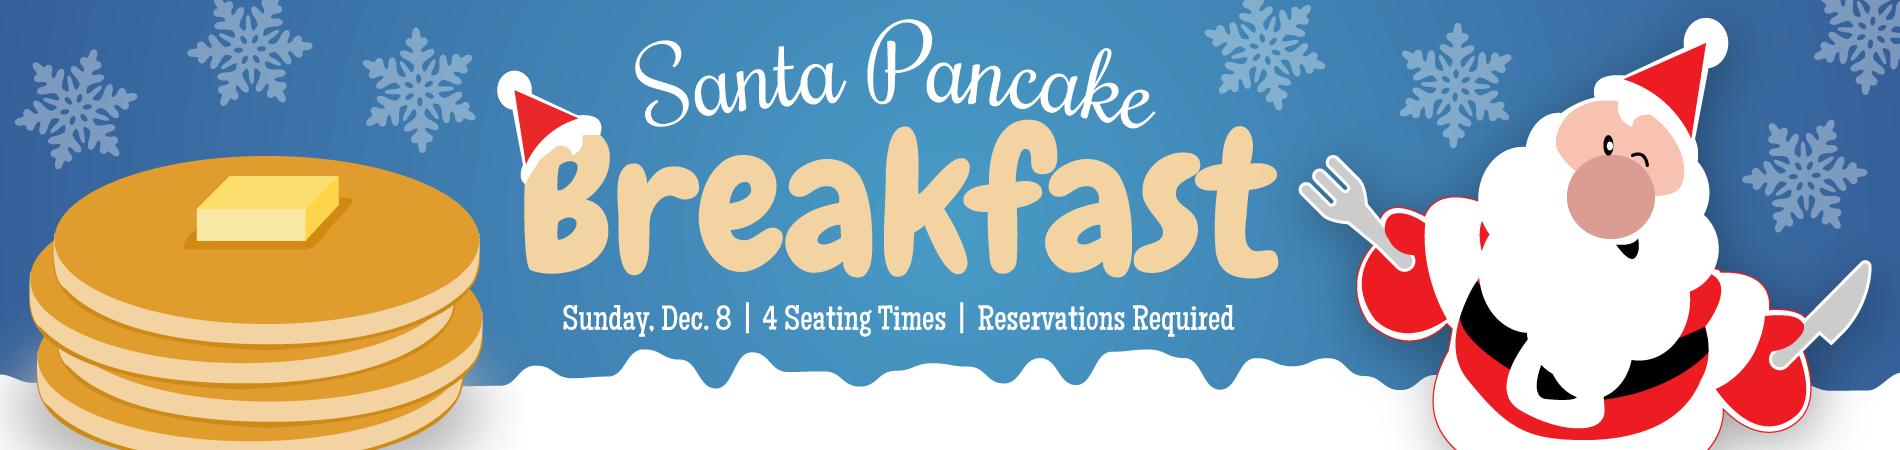 Santa Pancake Breakfast